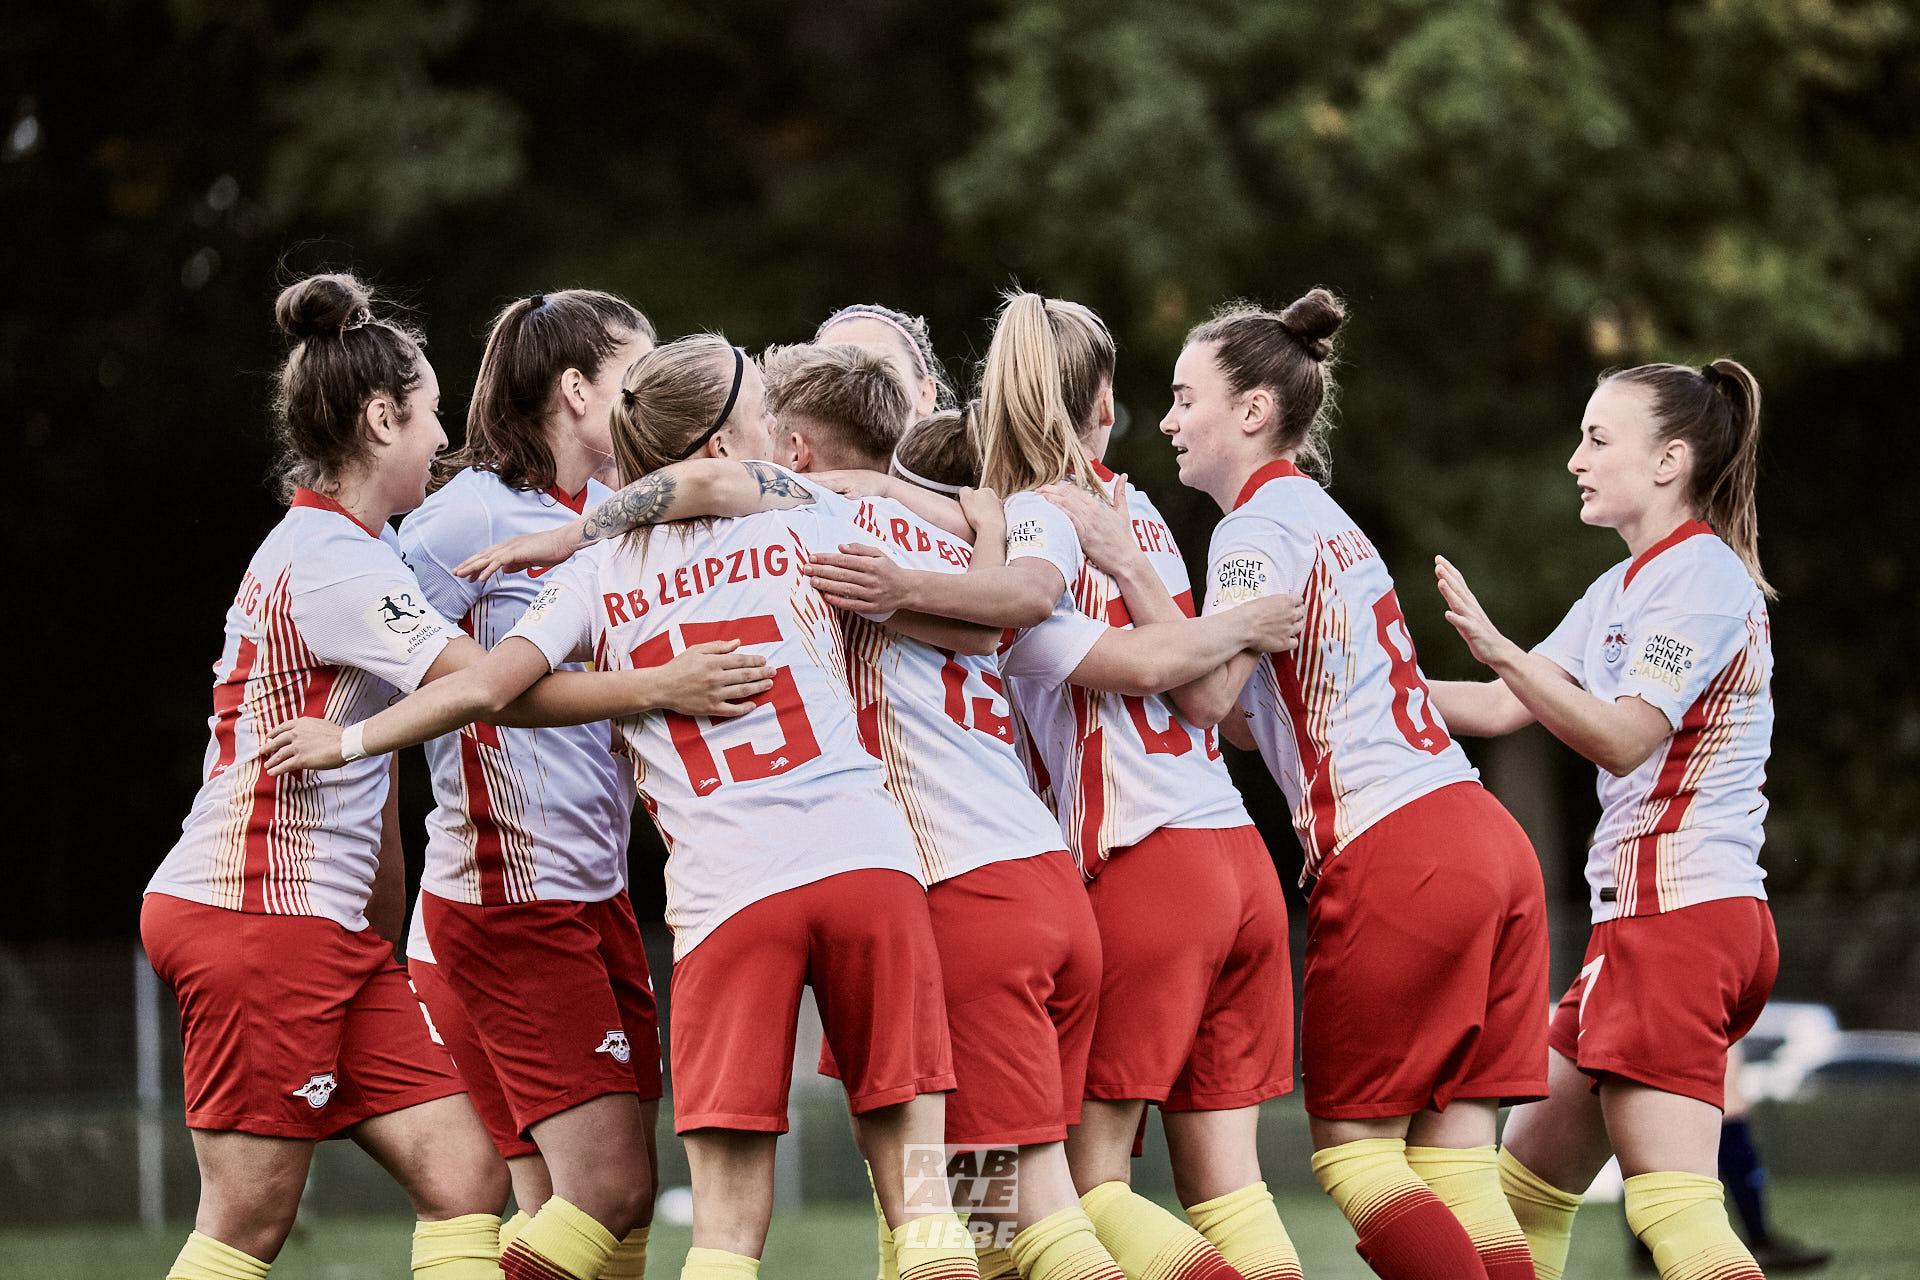 2. Frauenbundesliga: RB Leipzig -vs- Borussia Bocholt